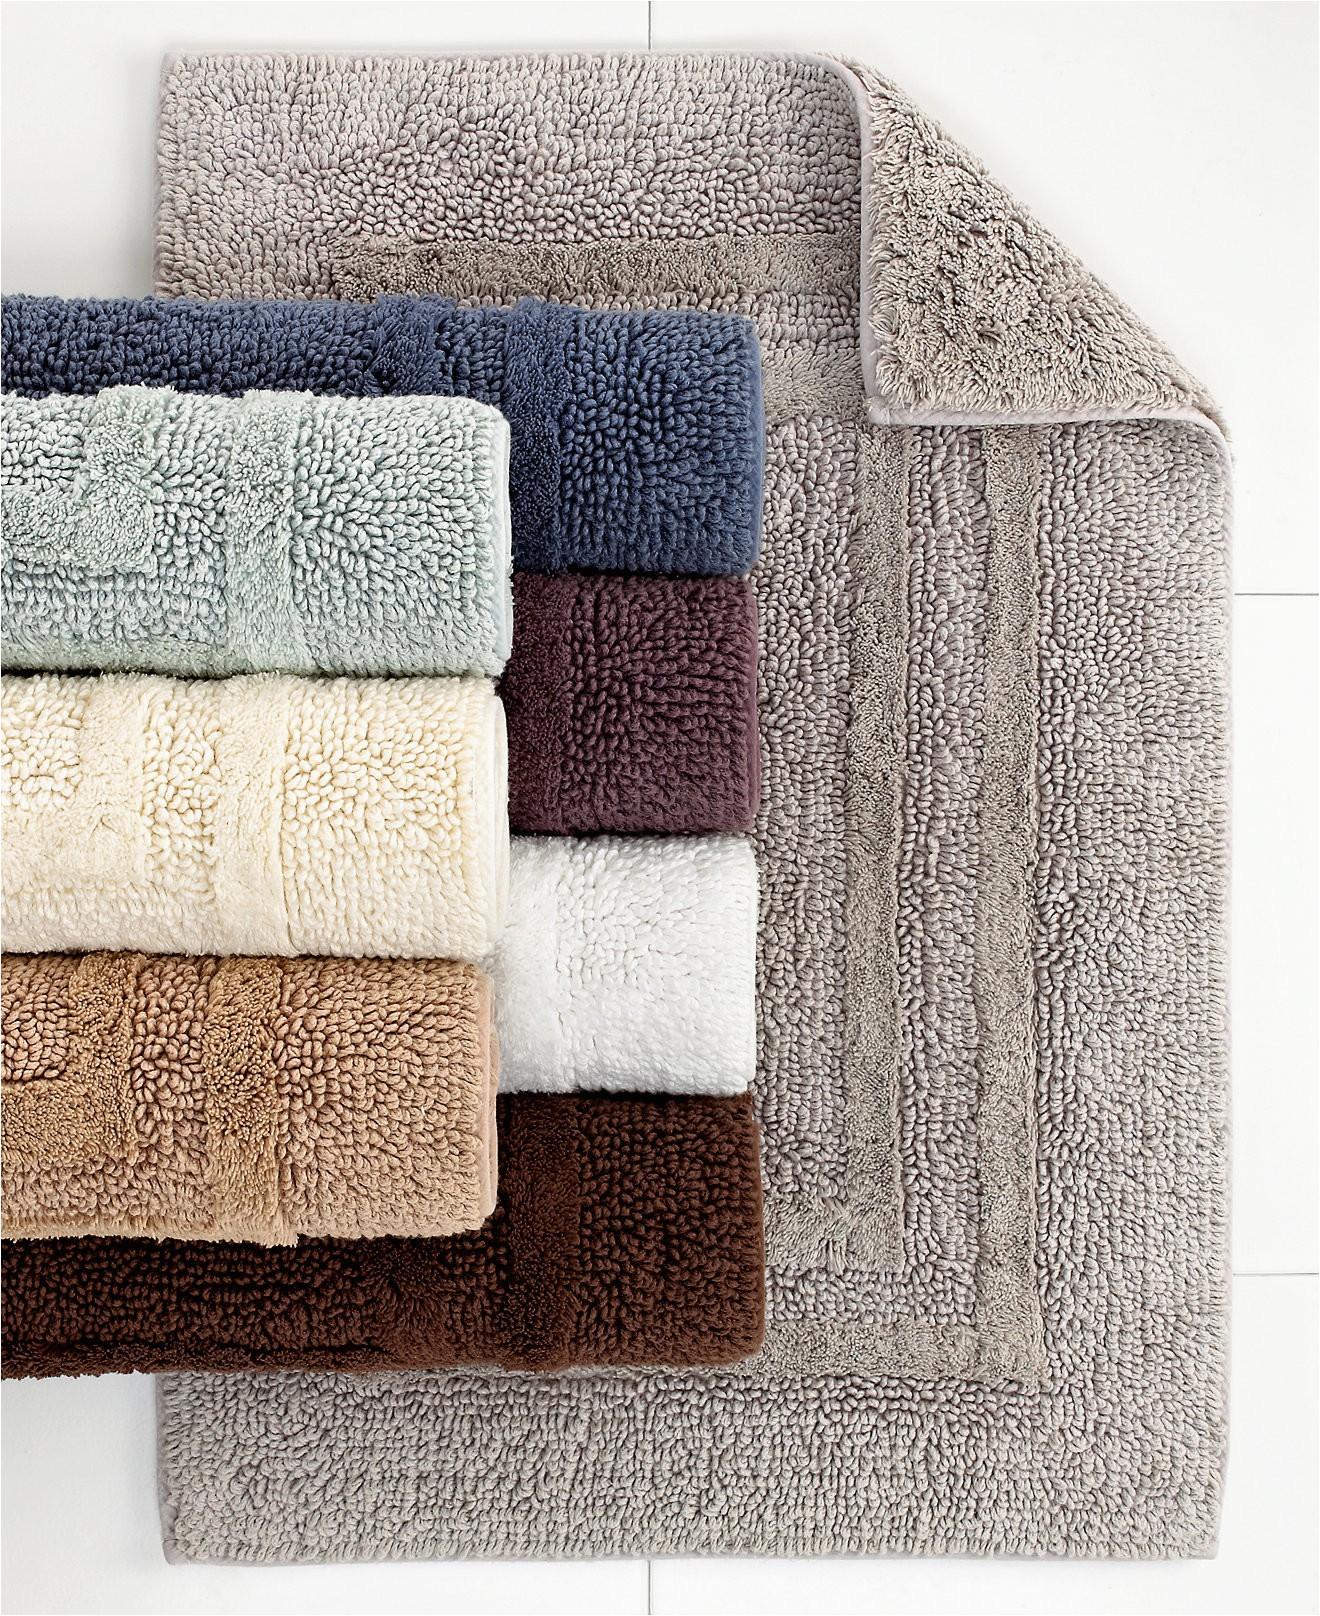 Kohl S Bath towels and Rugs Blue Bathroom Rugs Kohls Image Of Bathroom and Closet